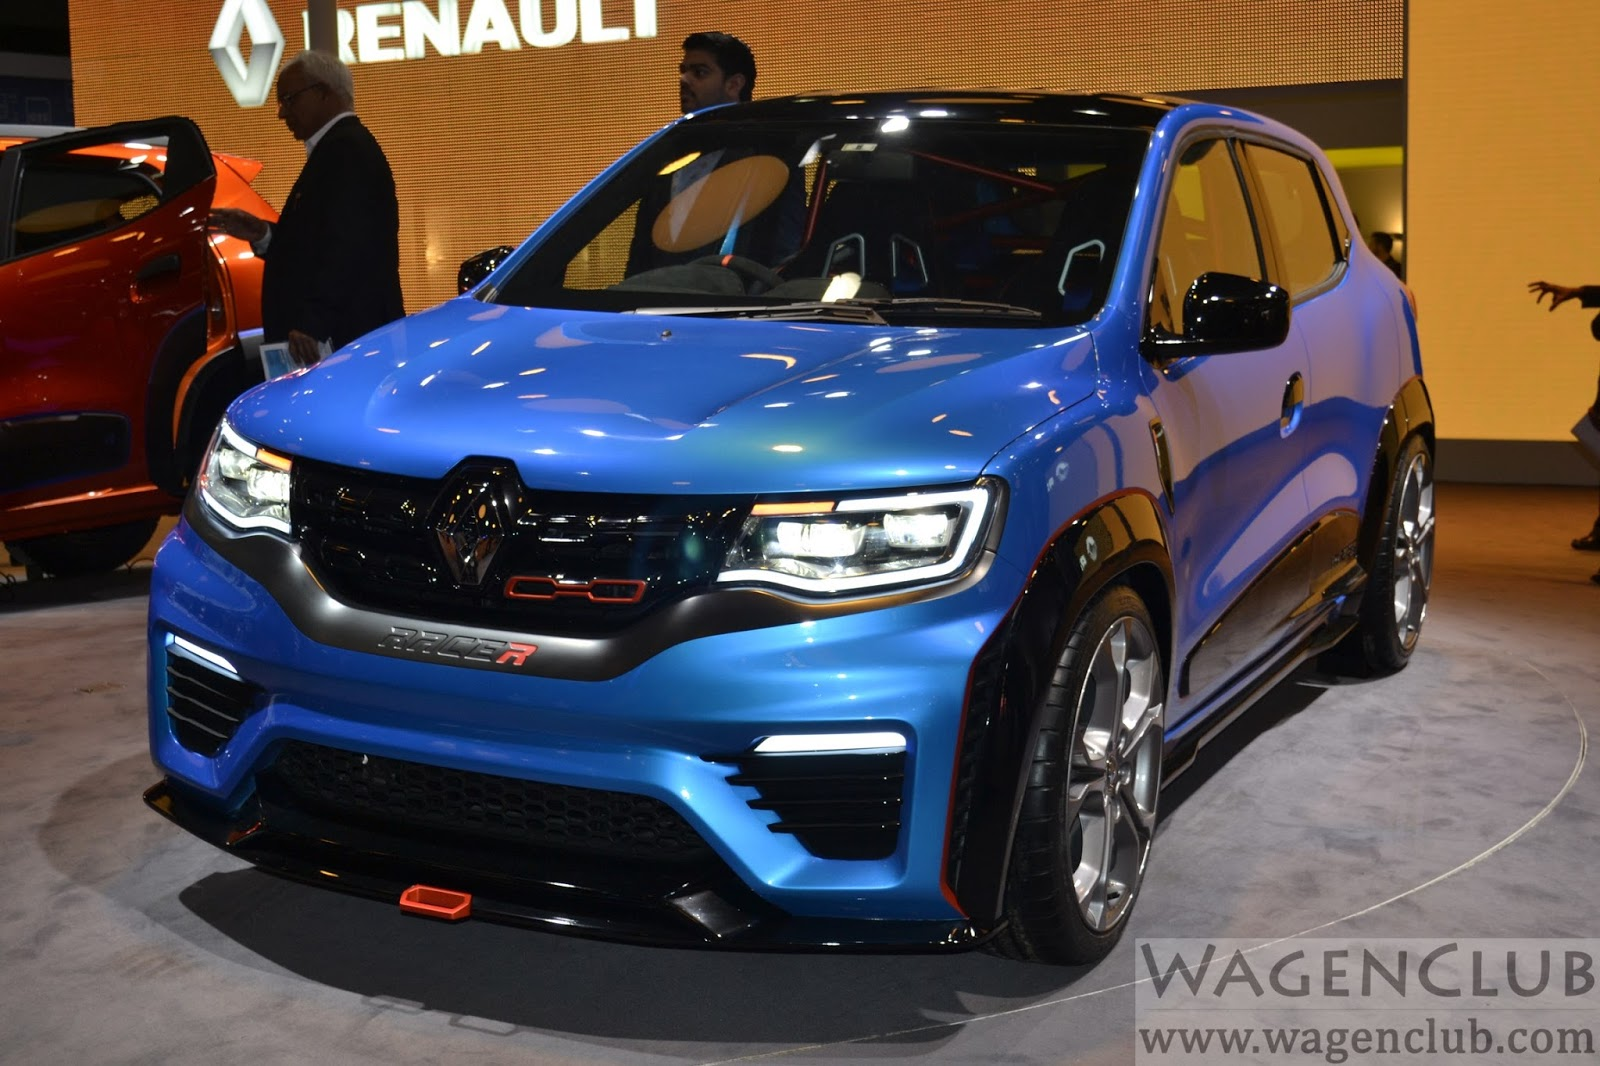 2016 Delhi Auto Expo Top 10 Concept Cars: Renault Kwid Climber & Kwid Racer Concepts